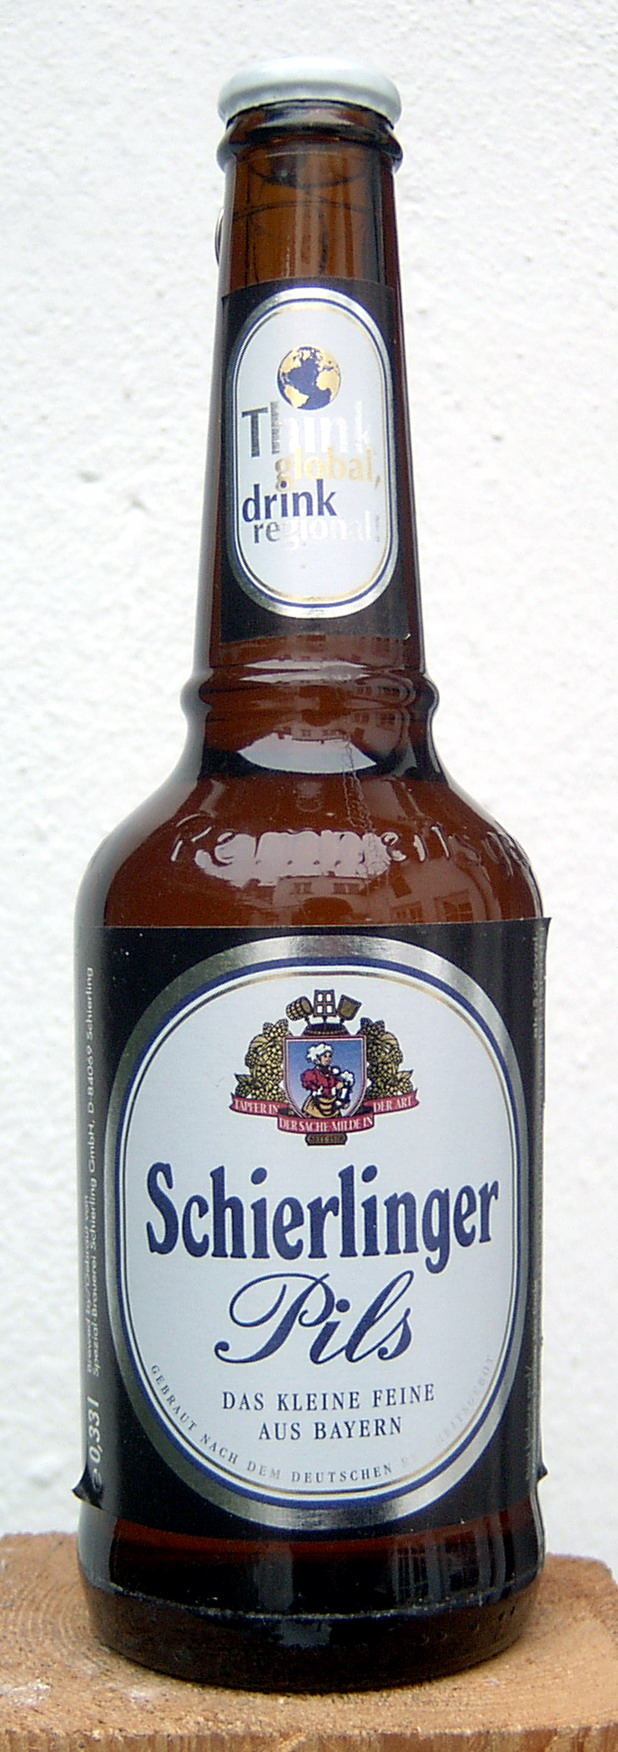 Schierlinger